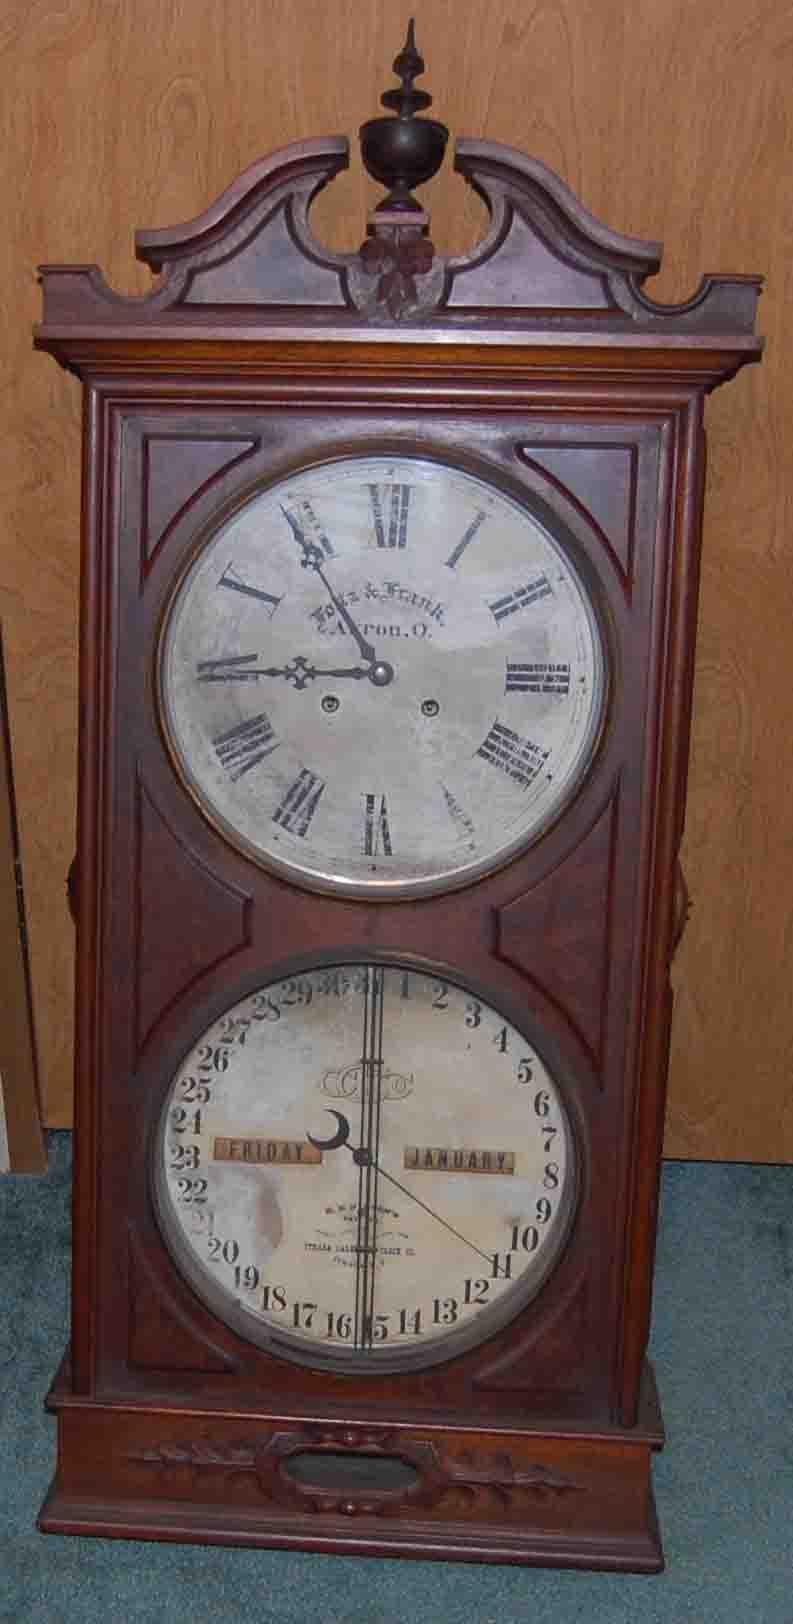 antique calendar clocks - mackey's clock repair parkersburg wv